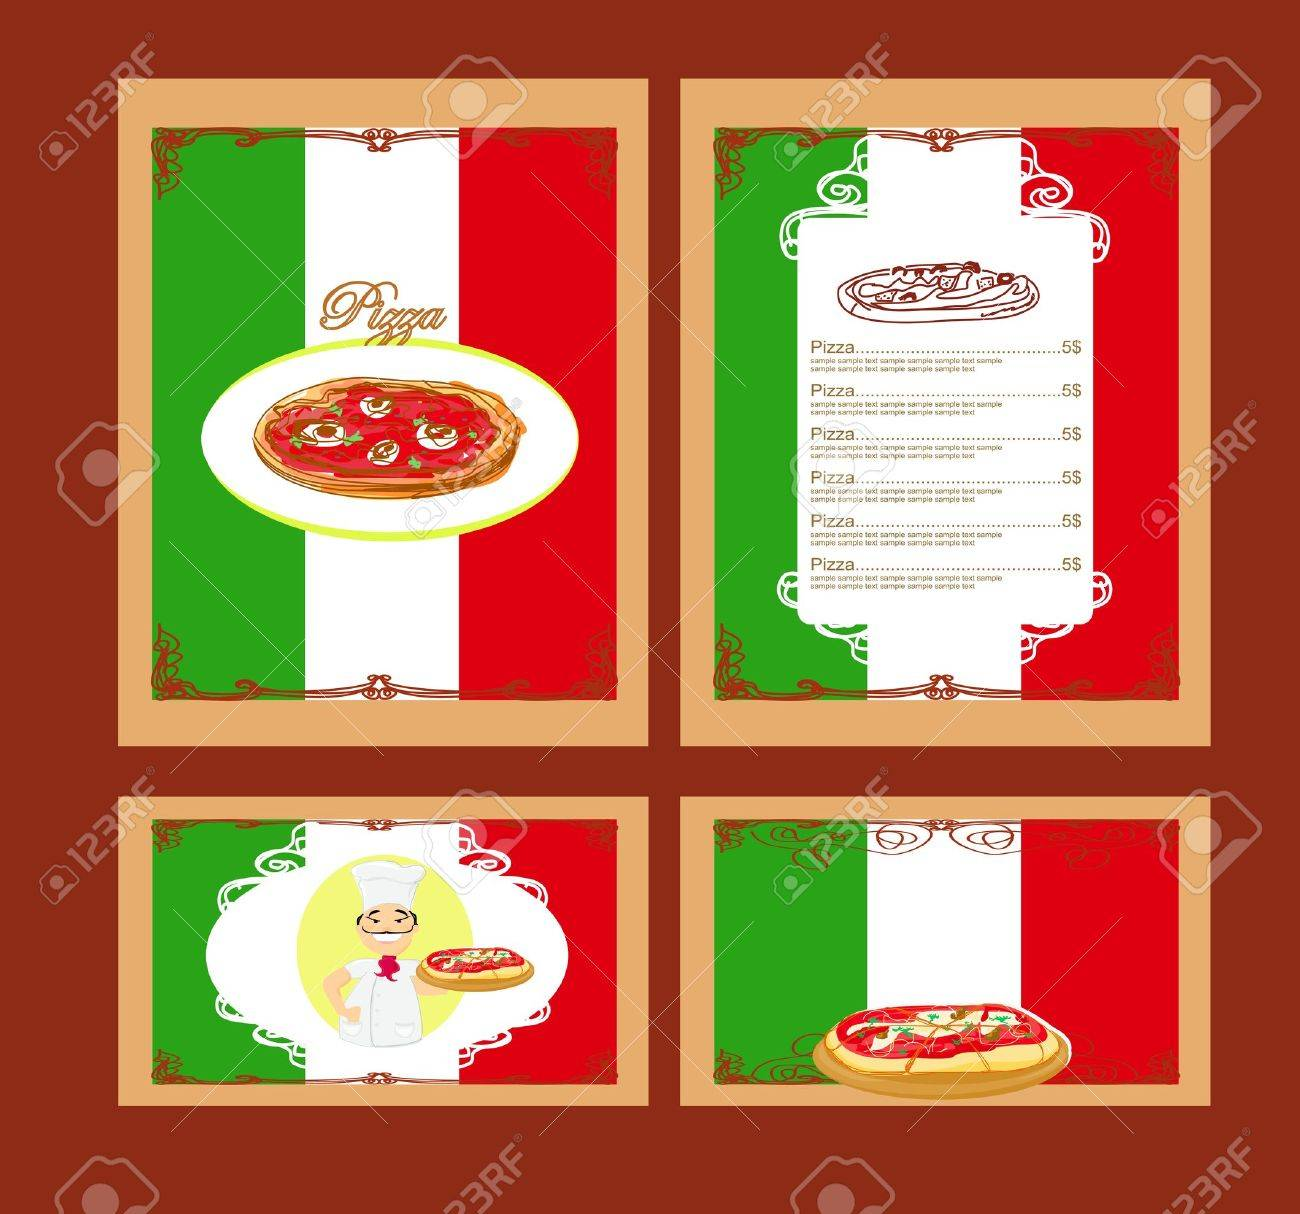 Pizza Menu Template Set Royalty Free Cliparts Vectors And – Sample Pizza Menu Template